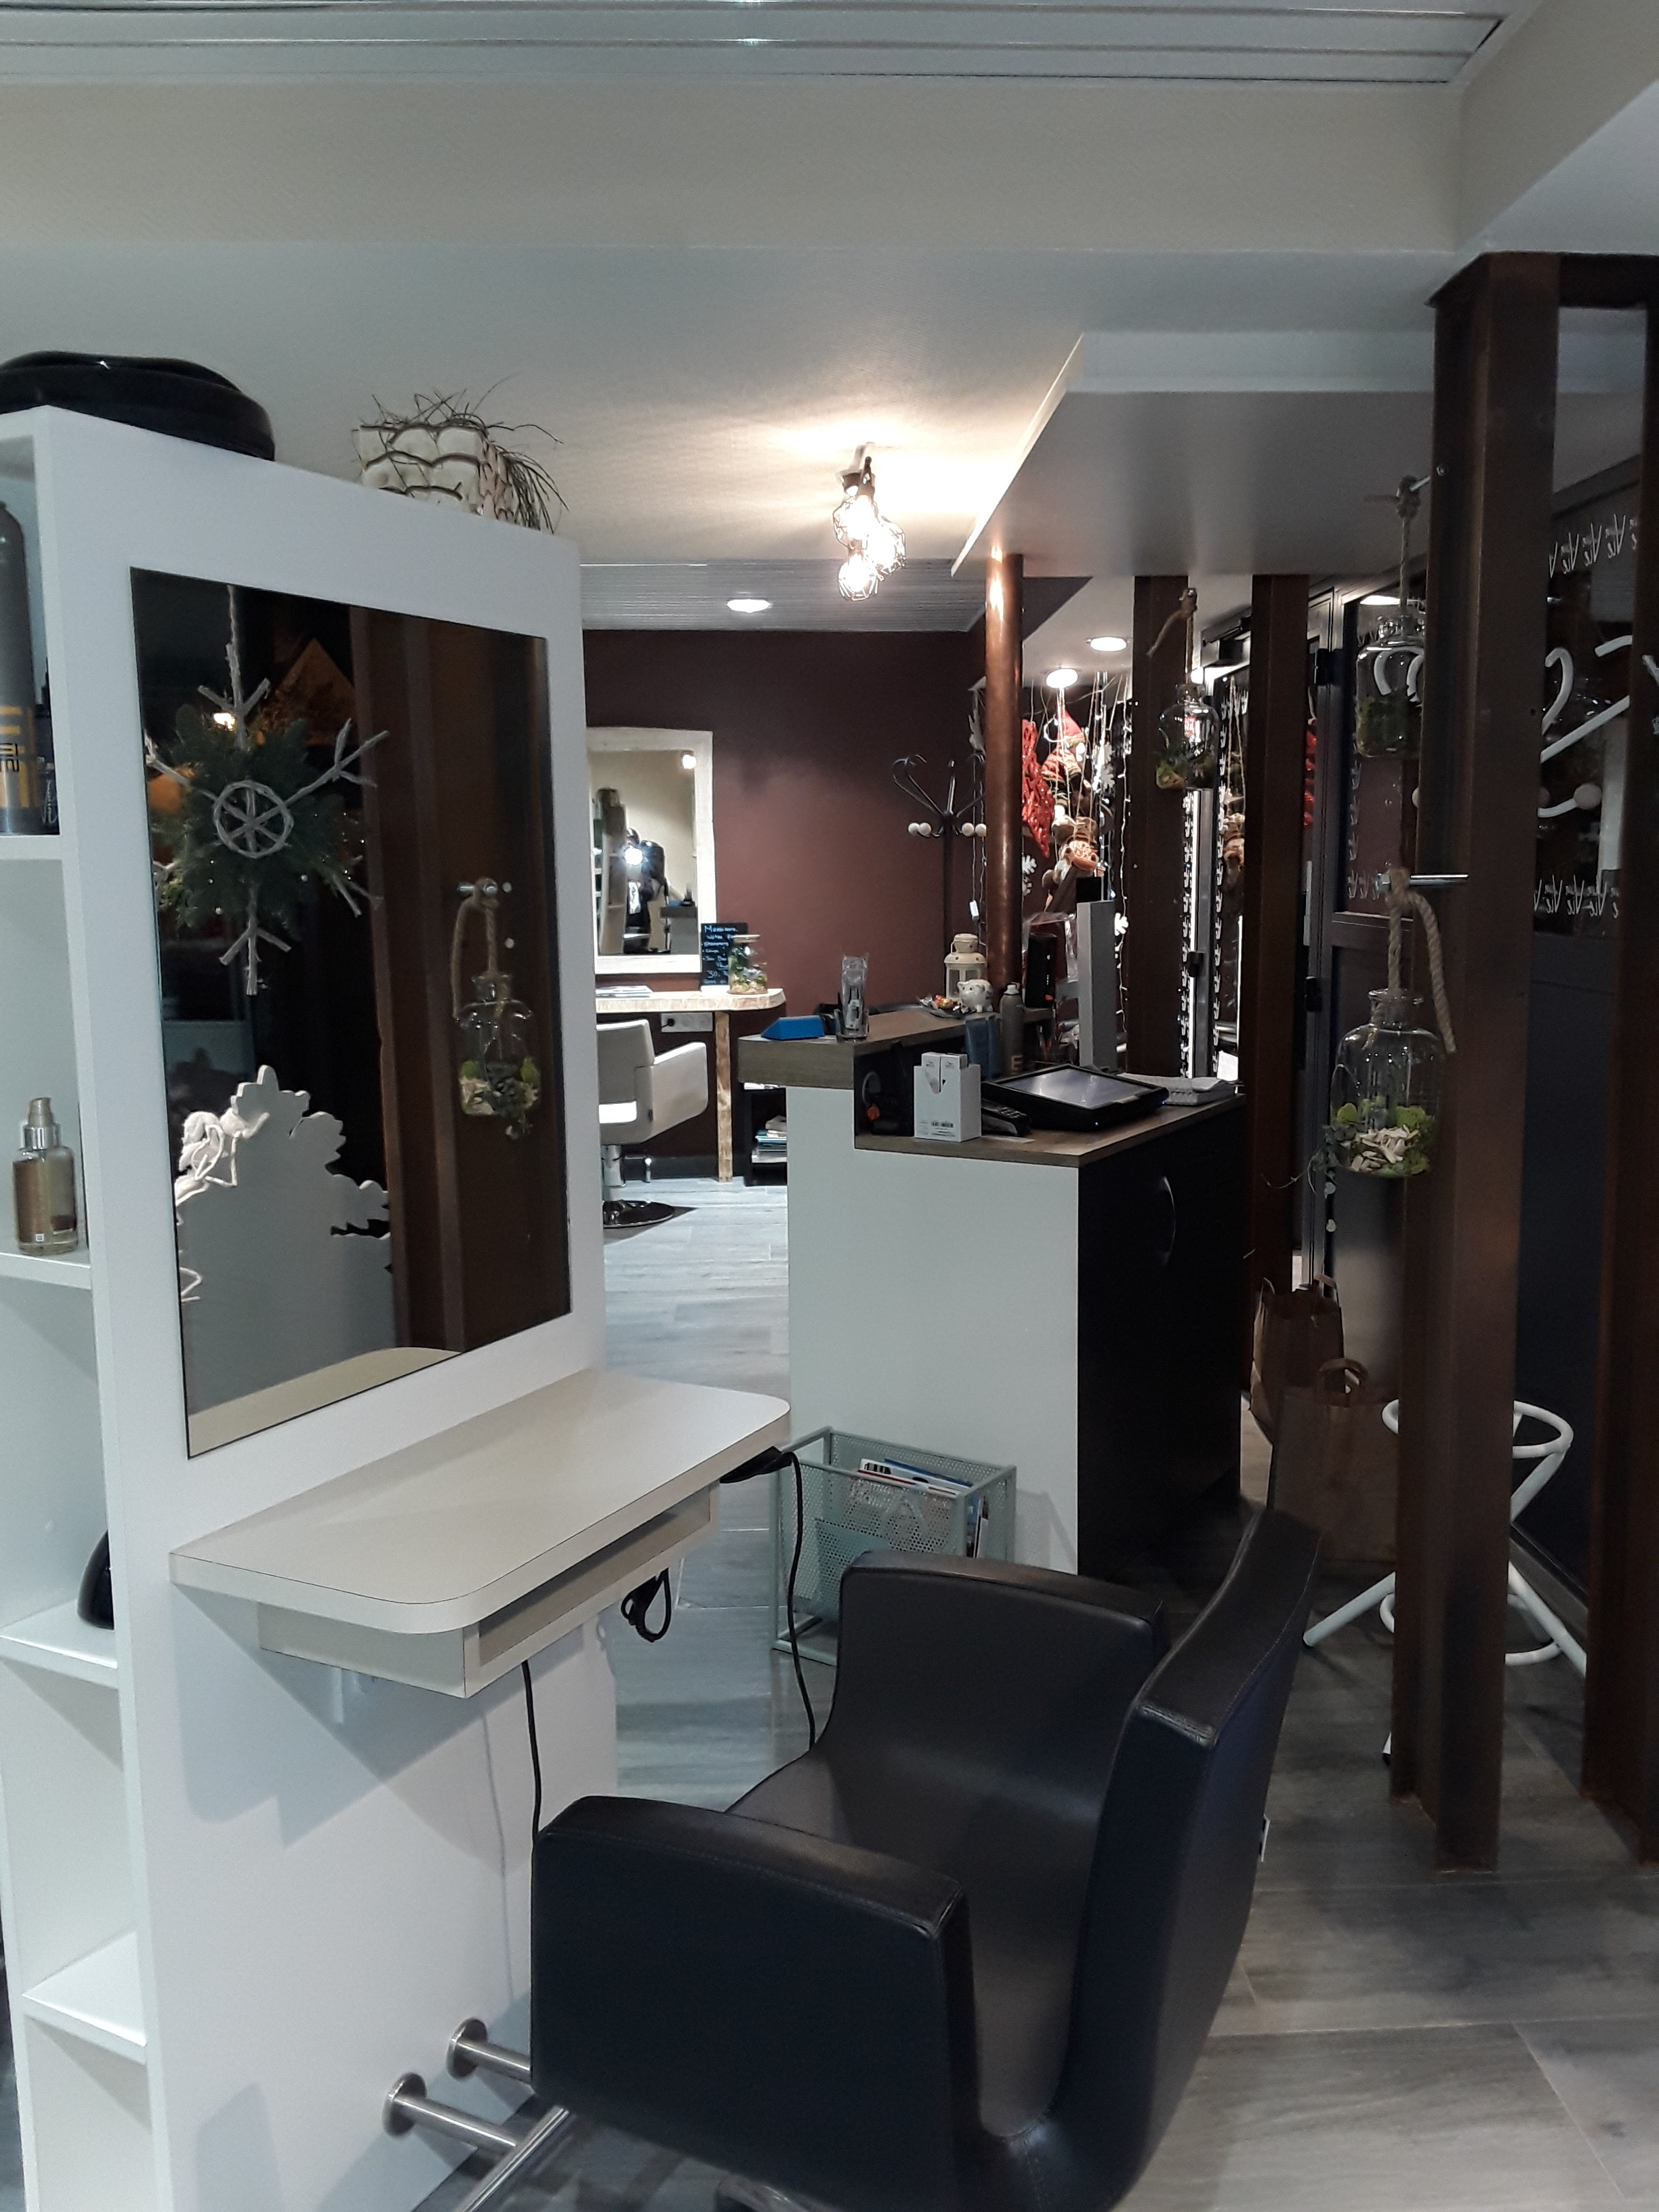 Galerie d'image - nuance coiffure